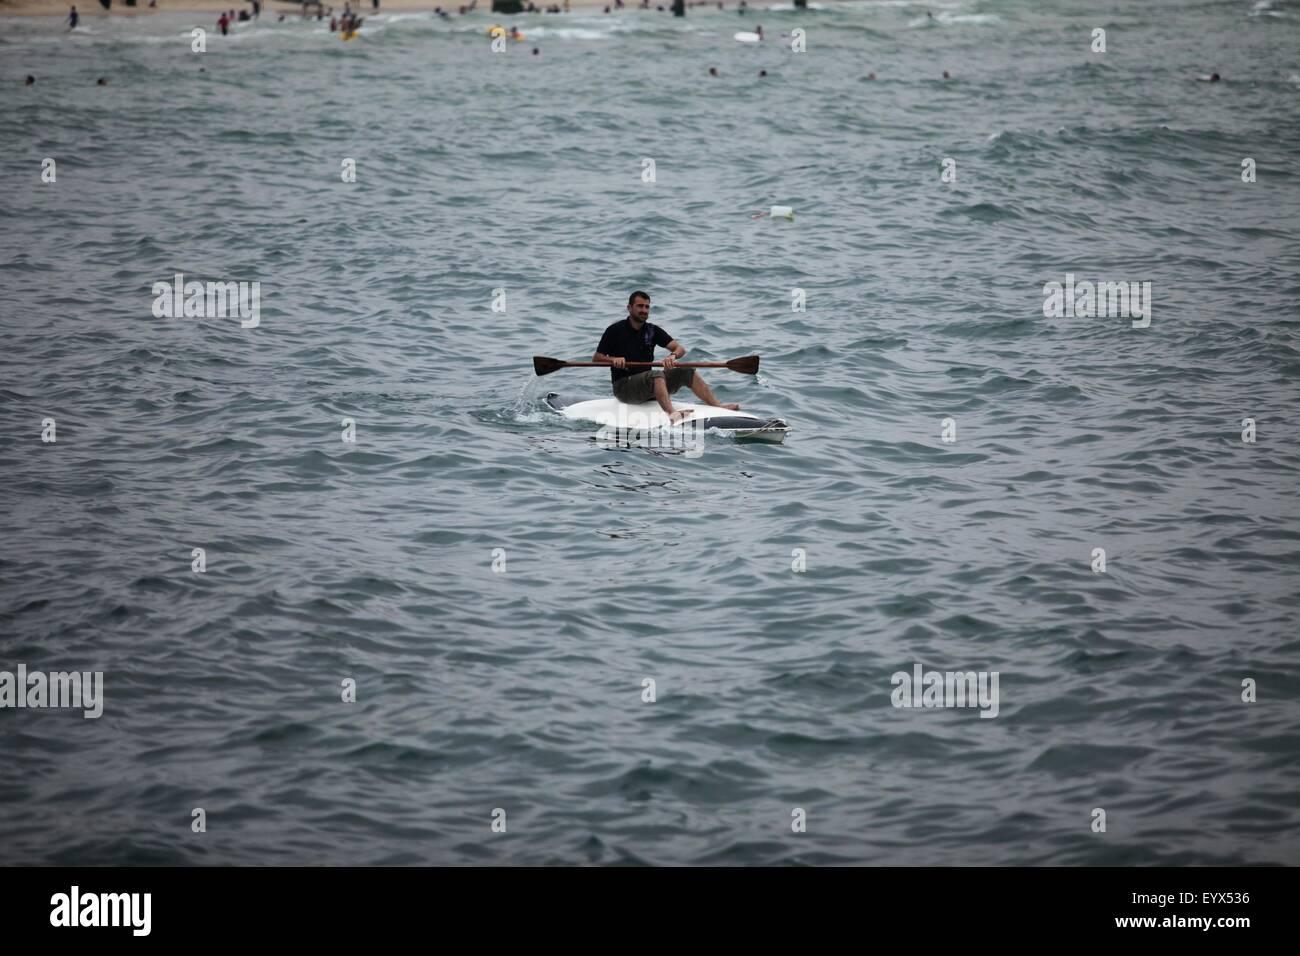 Gaza City, Gaza Strip, Palestinian Territory. 4th Aug, 2015. A Palestinian man rides a boat in the Mediterranean - Stock Image